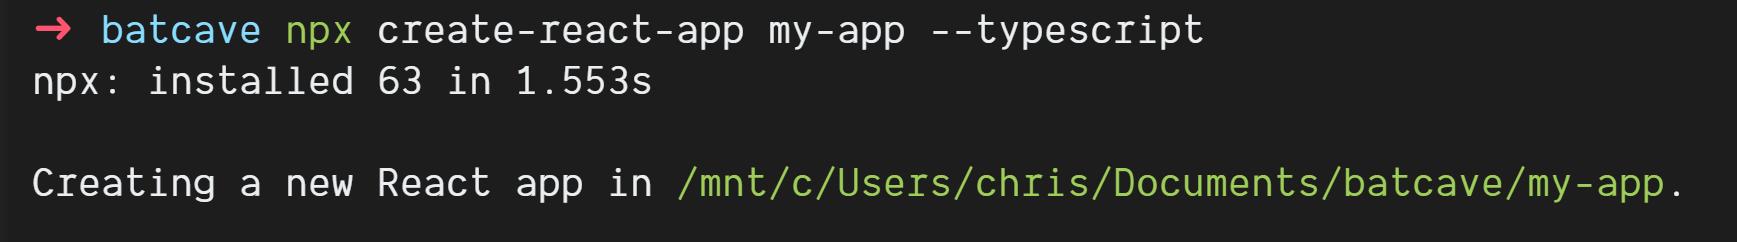 Output of `npx create-react-app my-typescript-app --typescript`